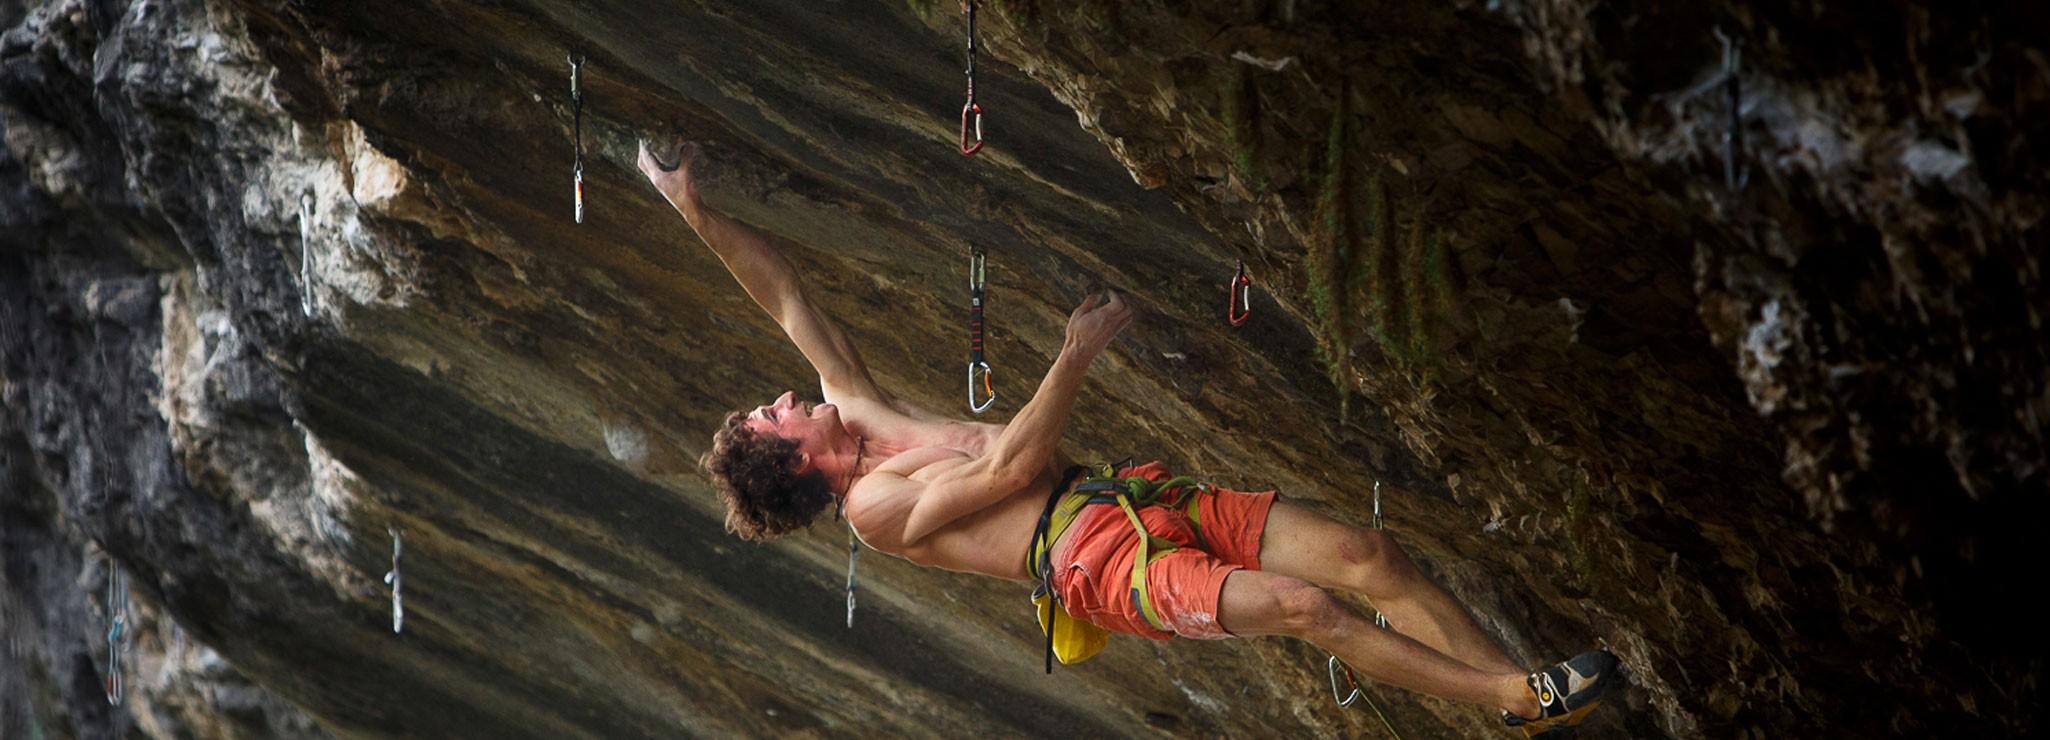 Klettern - Bergsport